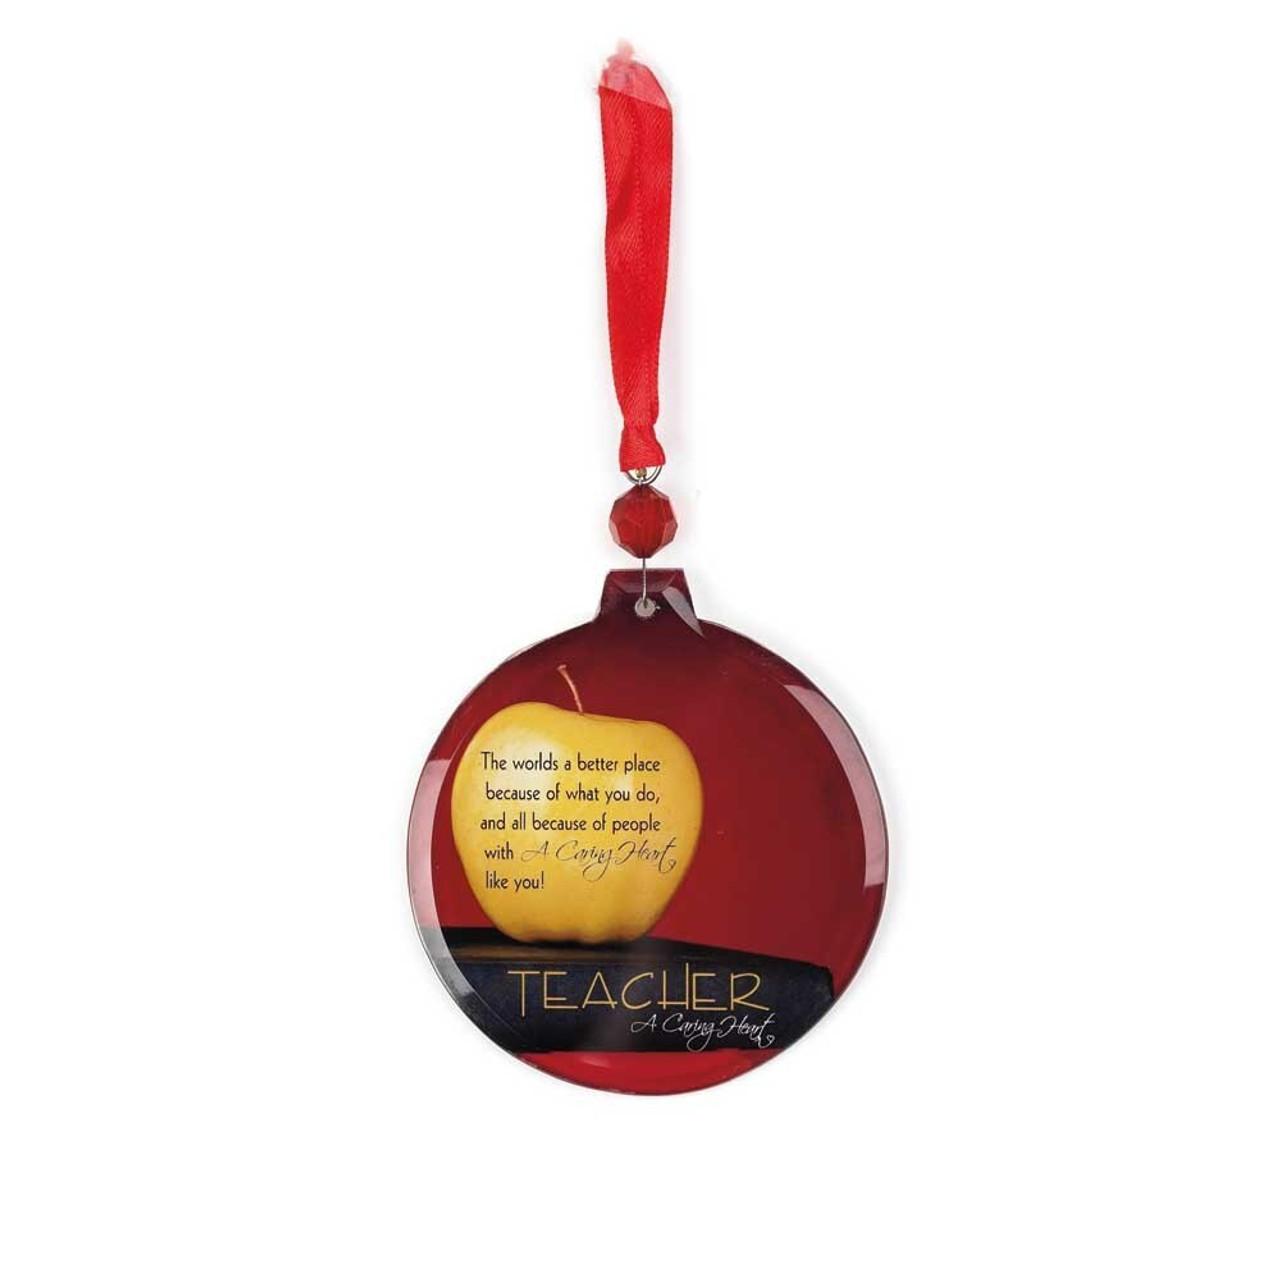 Teacher Christmas Ornament Caring Heart Poem 3 1 2 Glass Cho734 F C Ziegler Company